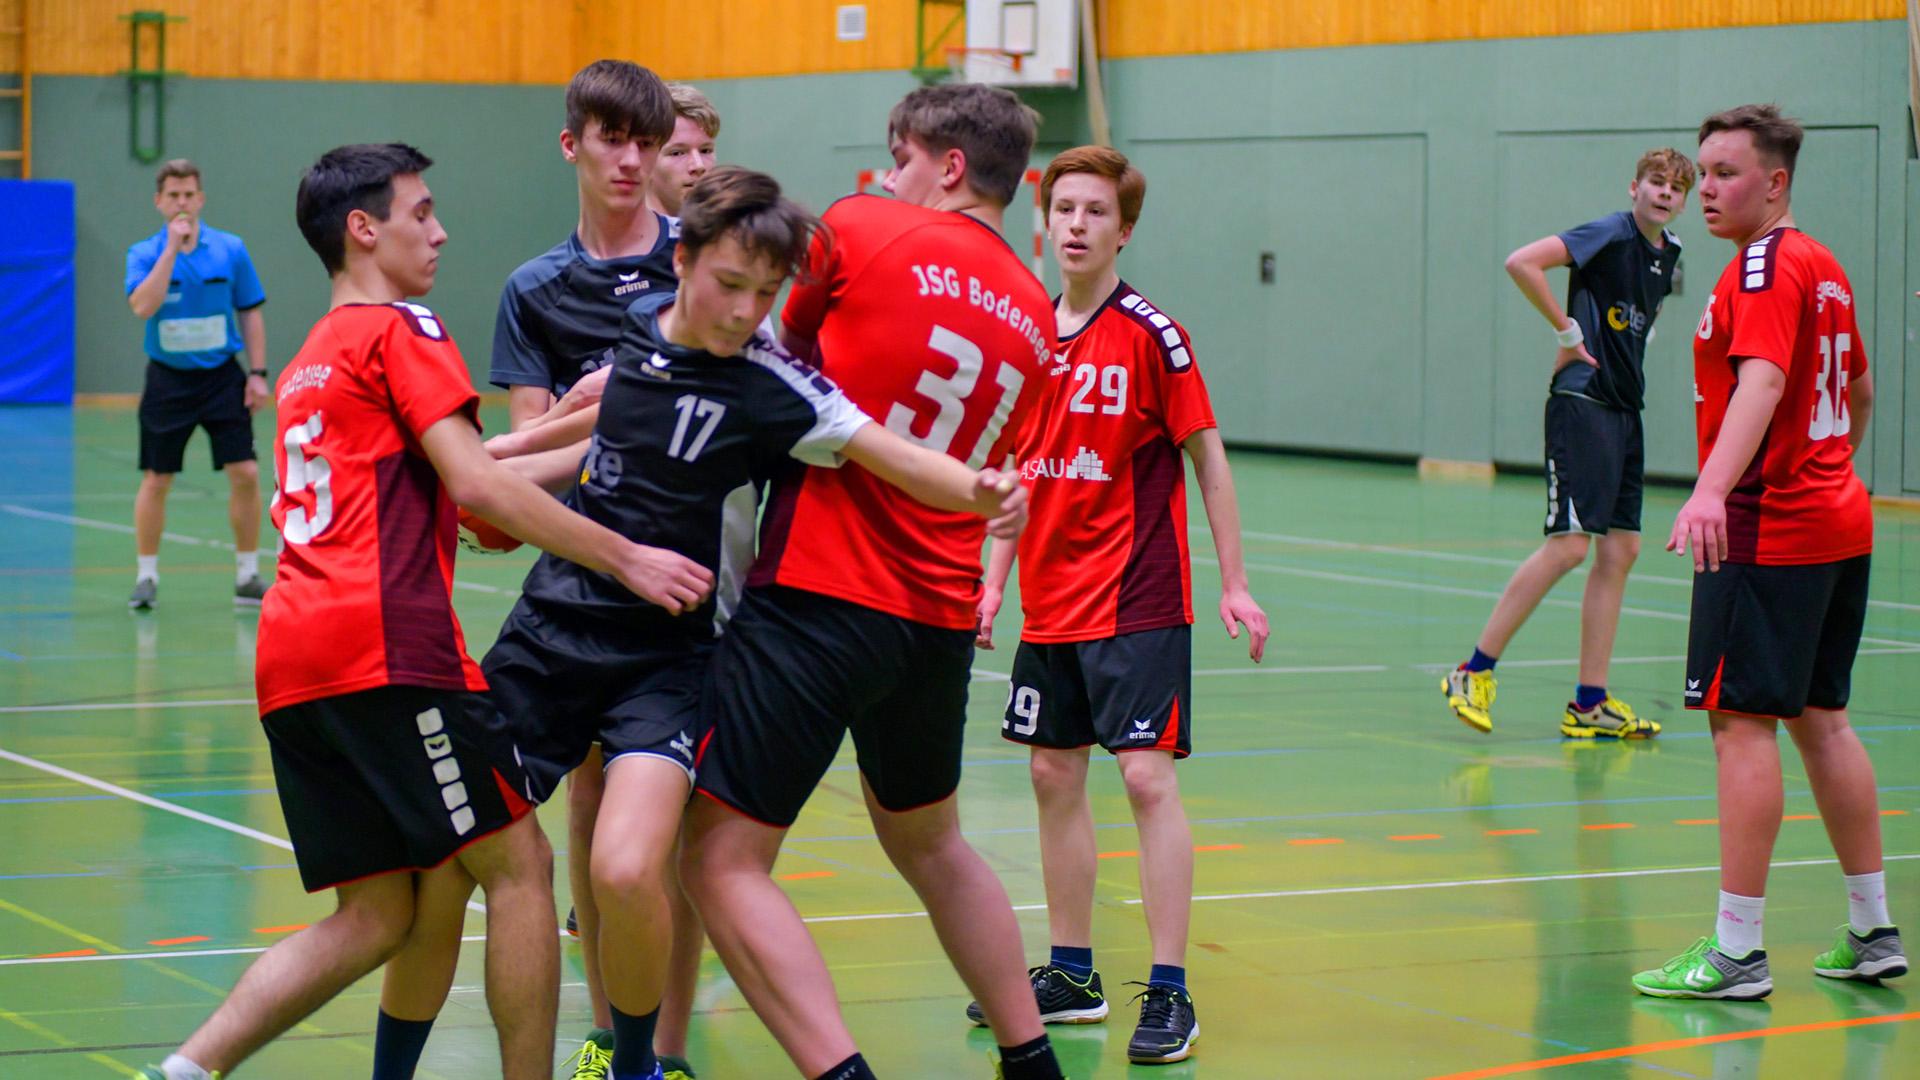 081Slider_mA_tsg_leutkirch_handball